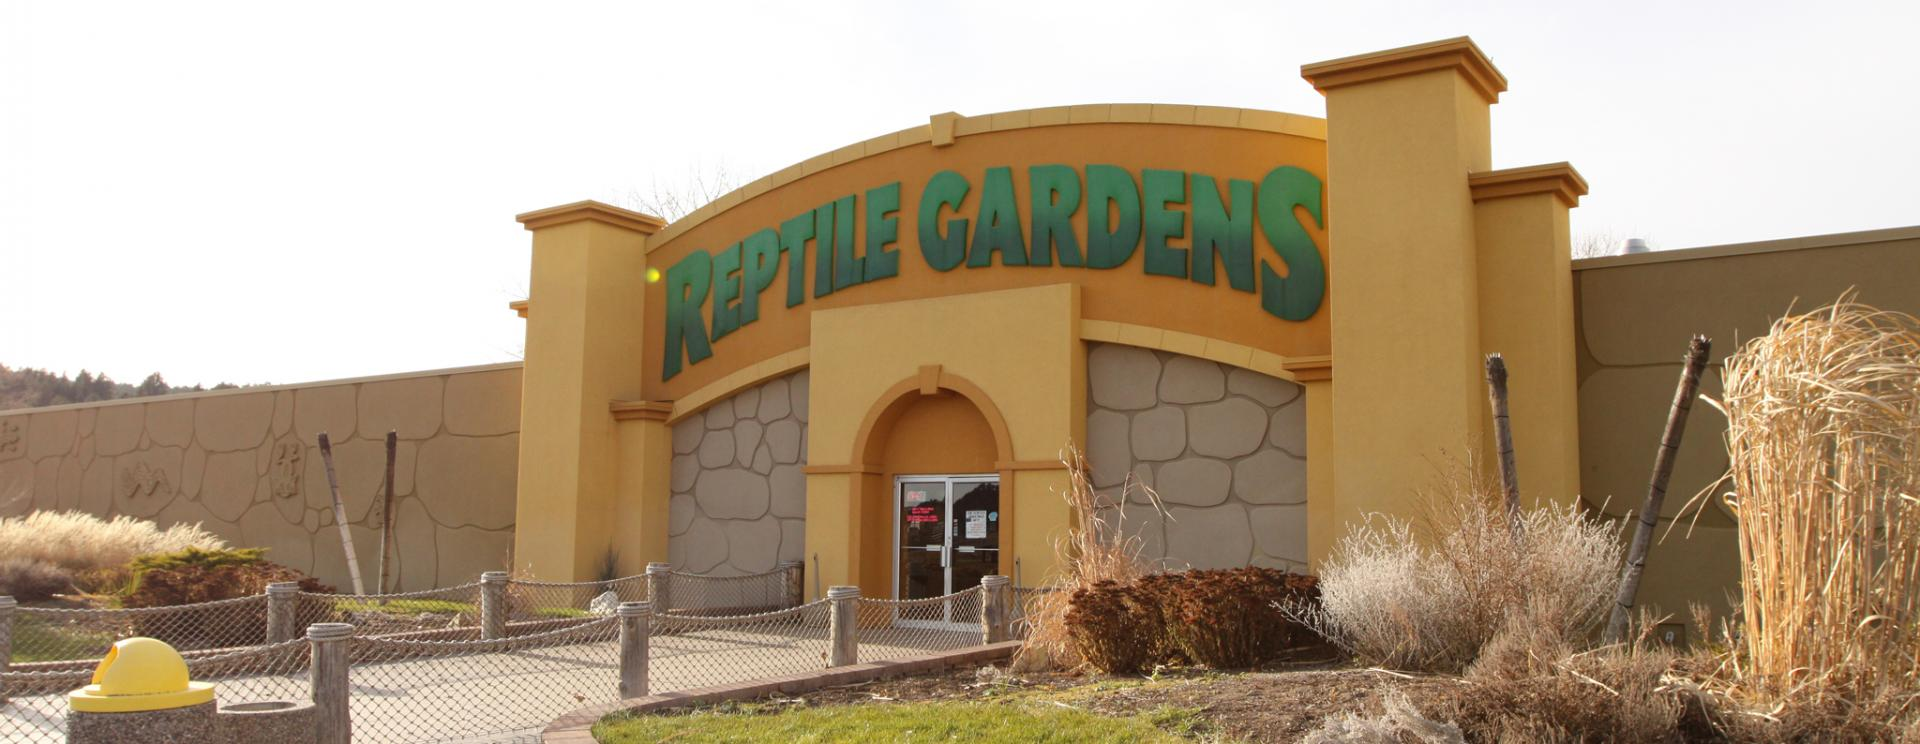 12222 Reptile Gardens Admission